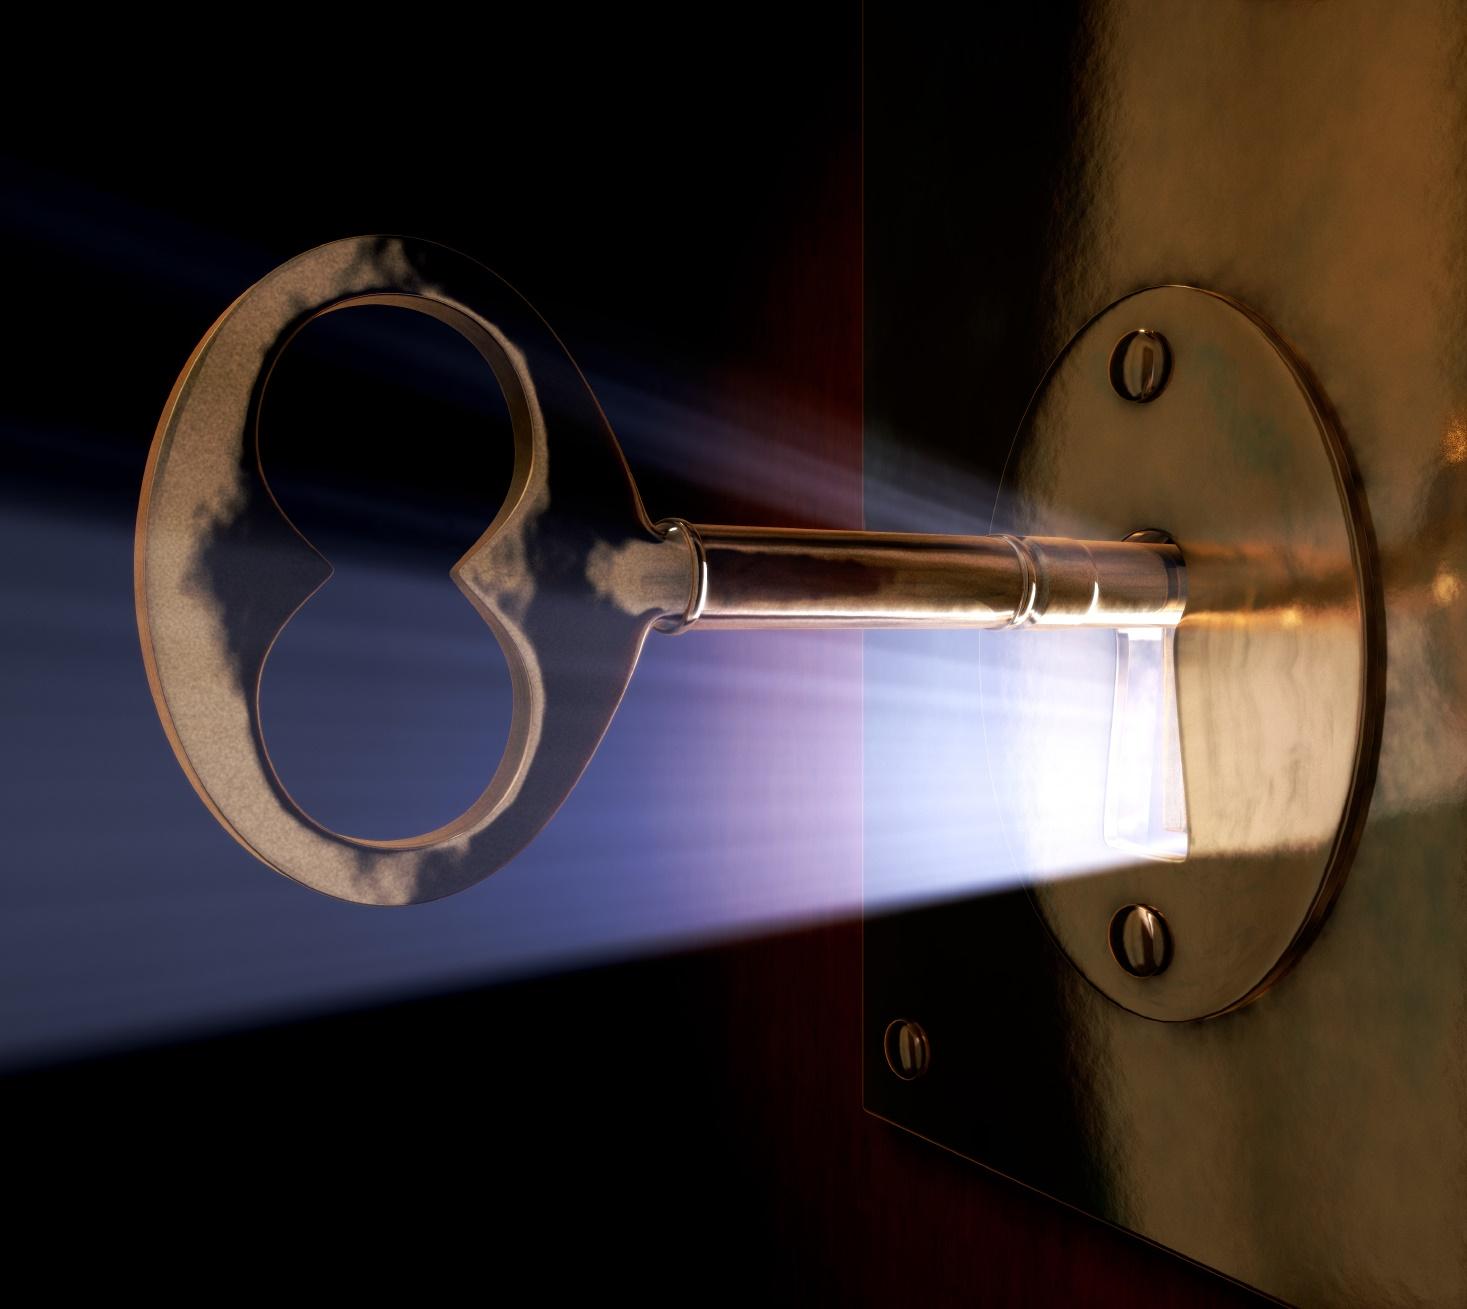 iStock-gold-lock-and-key